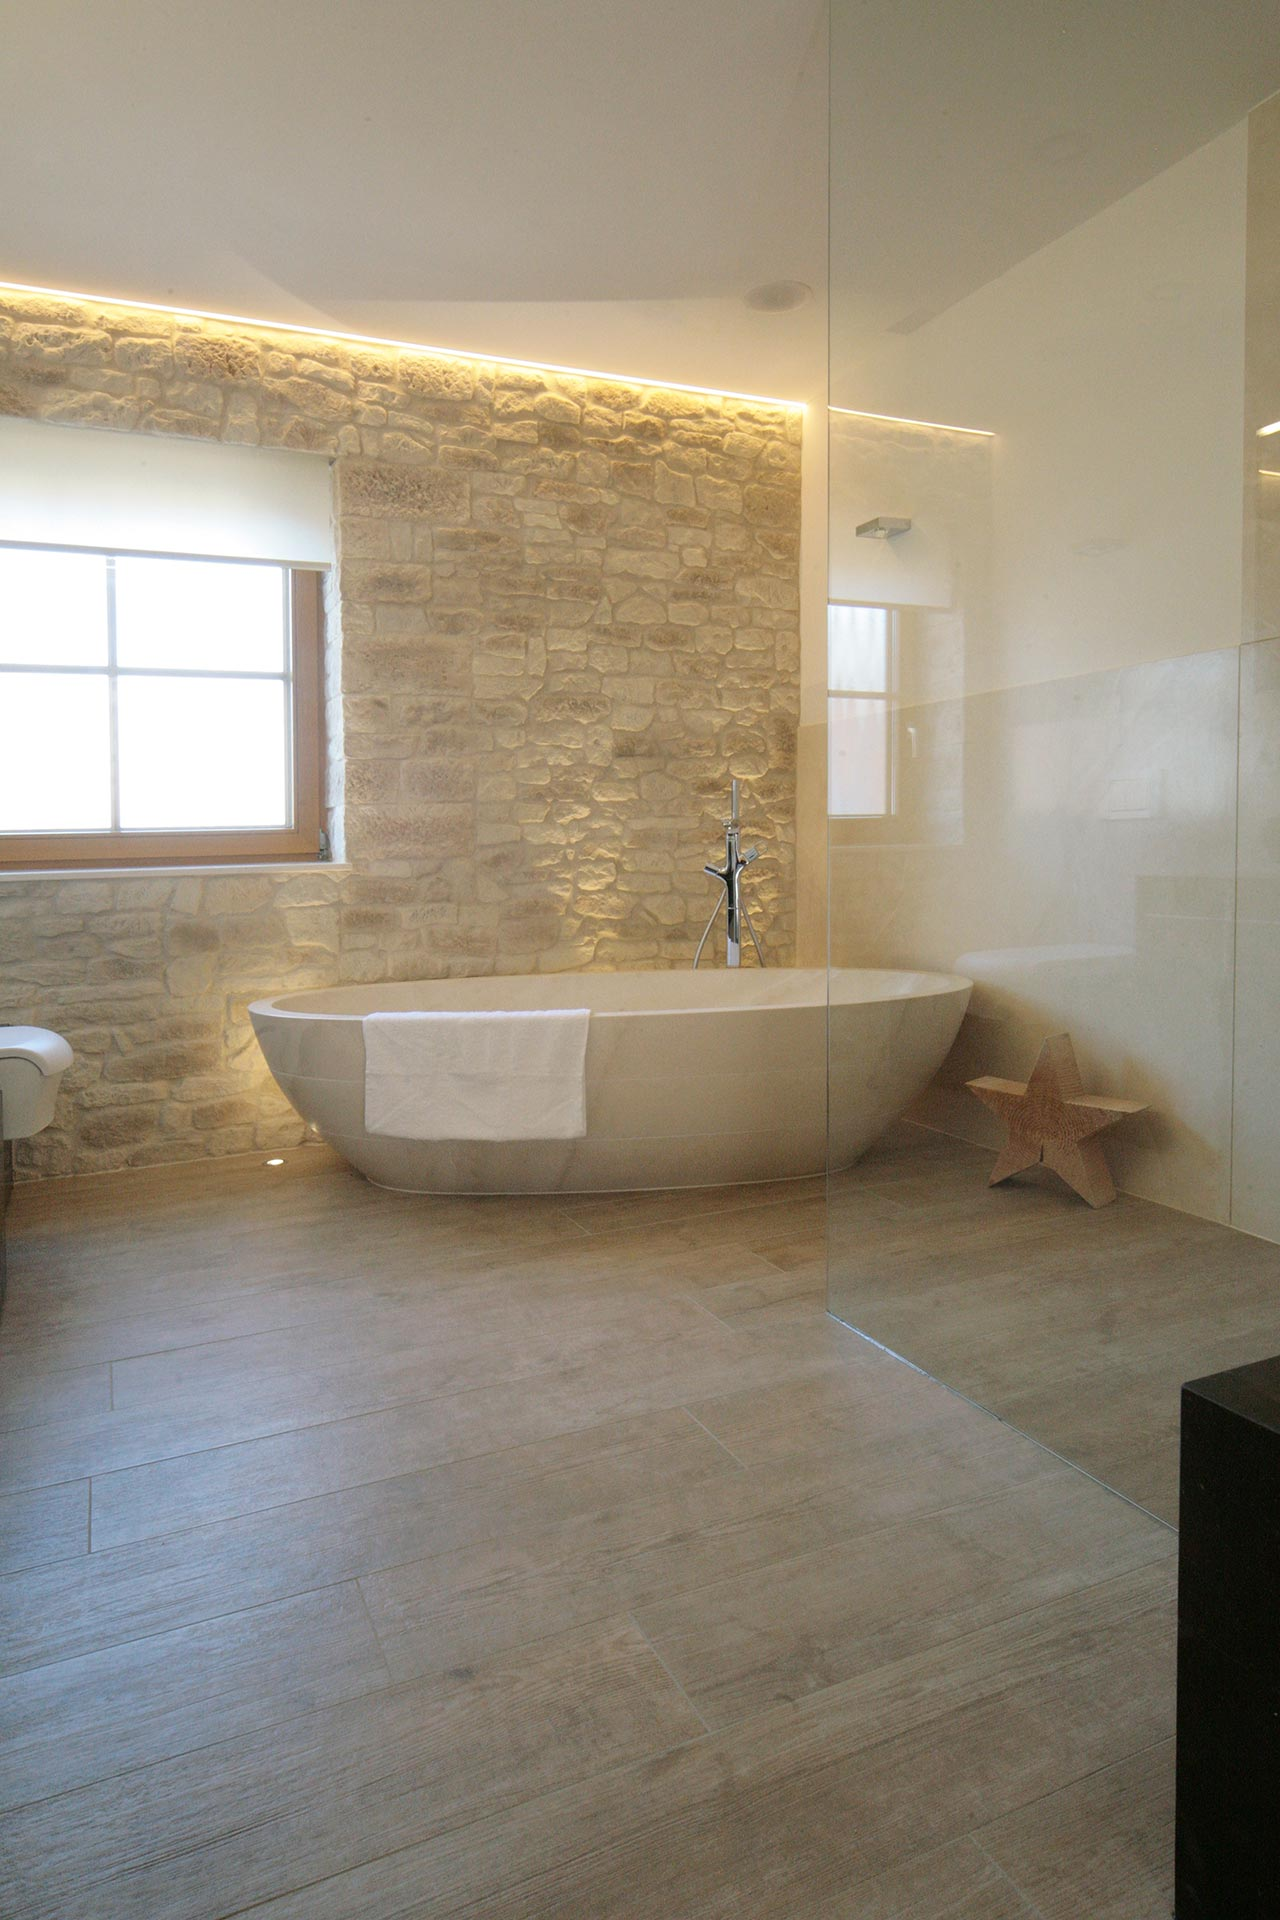 Actica gmbh actica planen einrichten badezimmer und for Badezimmer einrichten planen